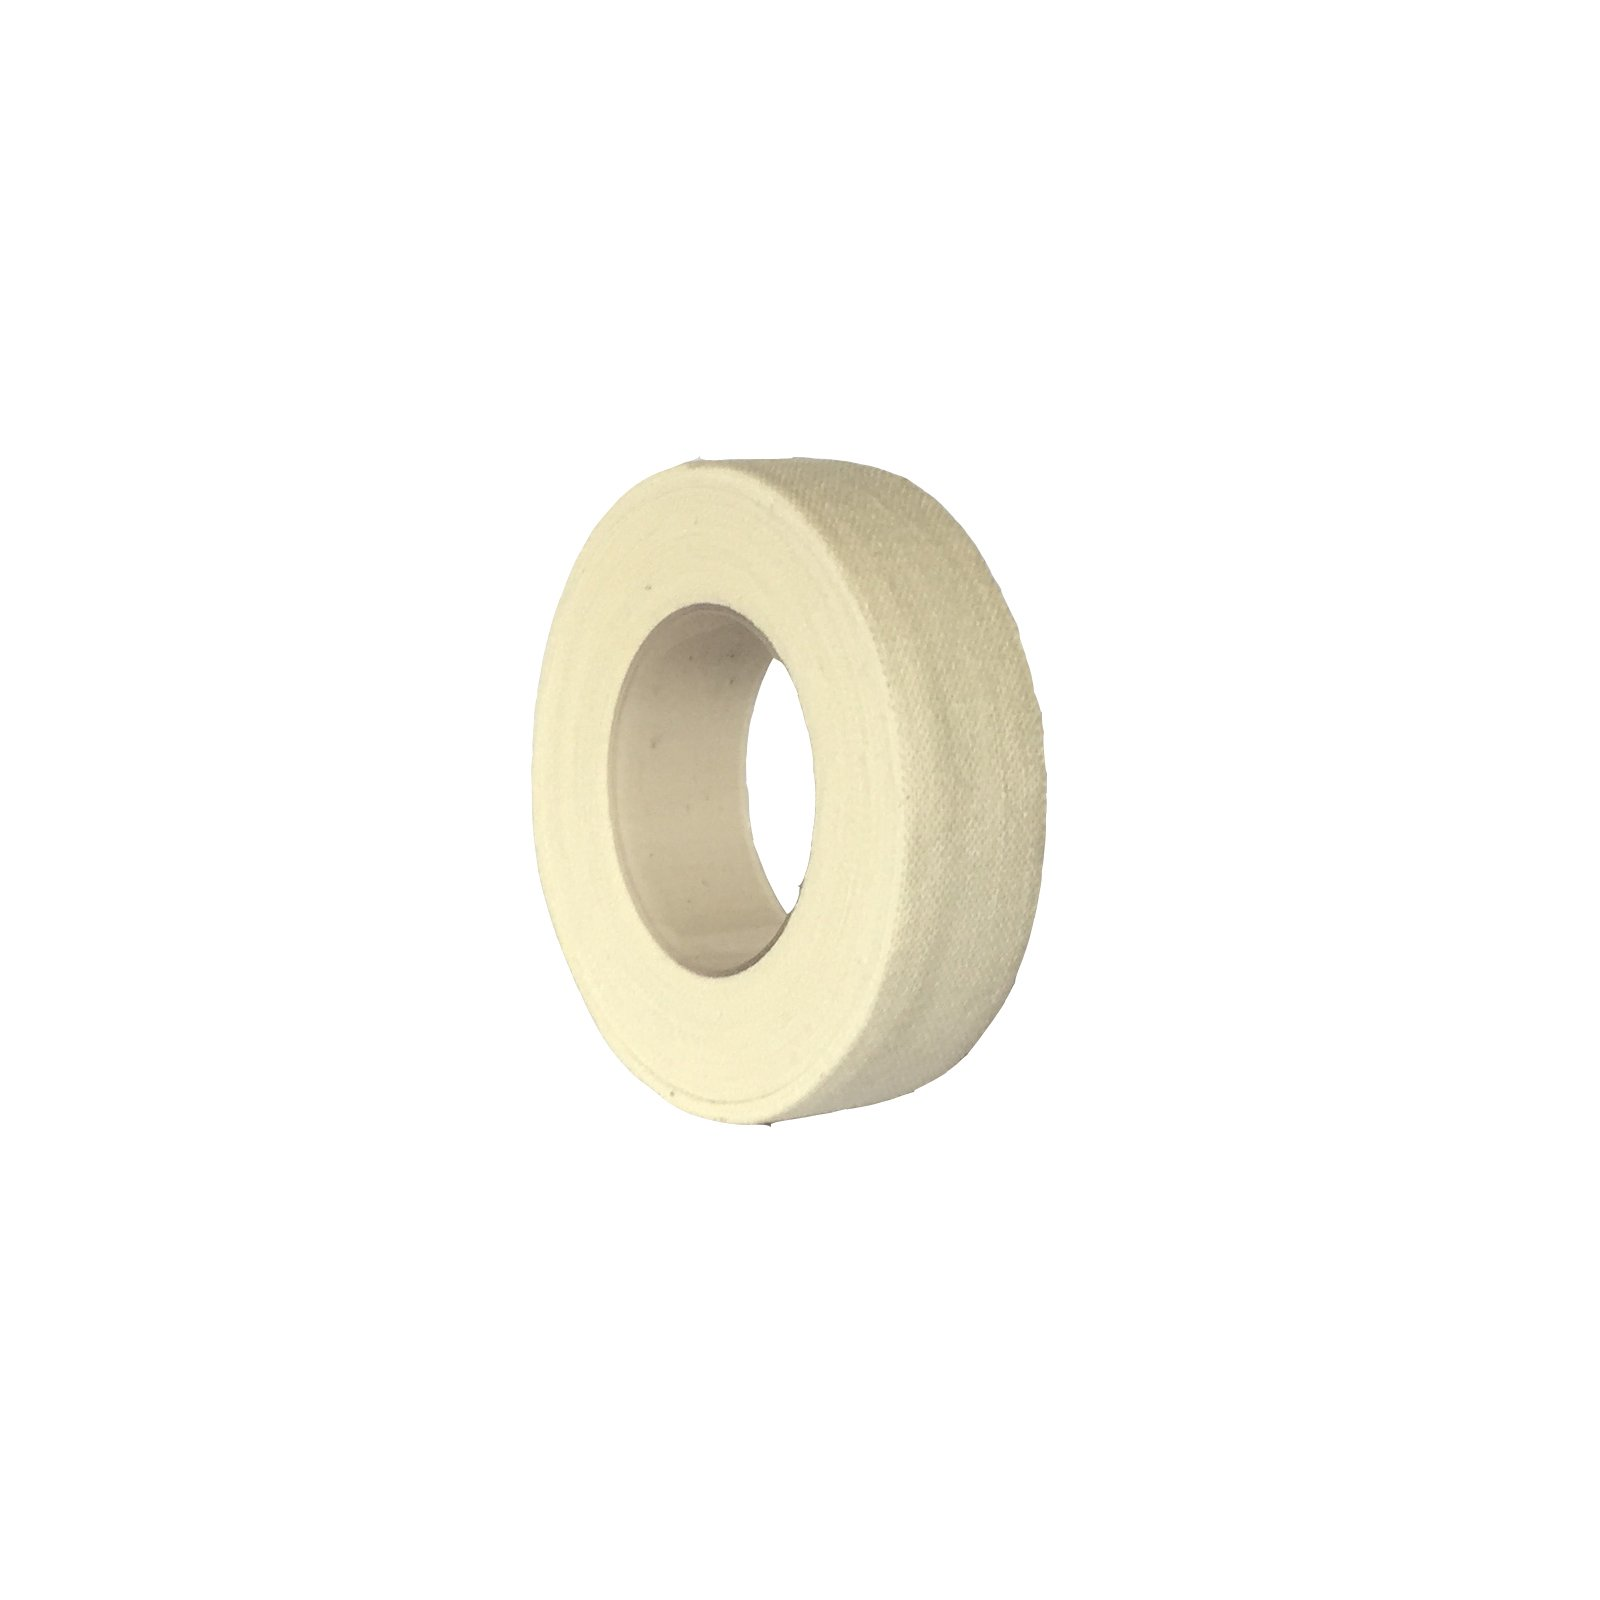 Steroplast 6 X STEROSPORT PREMIUM PROFESSIONAL ZINC OXIDE SPORTS PHYSIO BOXING TAPE FINGER THUMB HAND WRIST STRAPPING WHITE 1.25CM x 5M